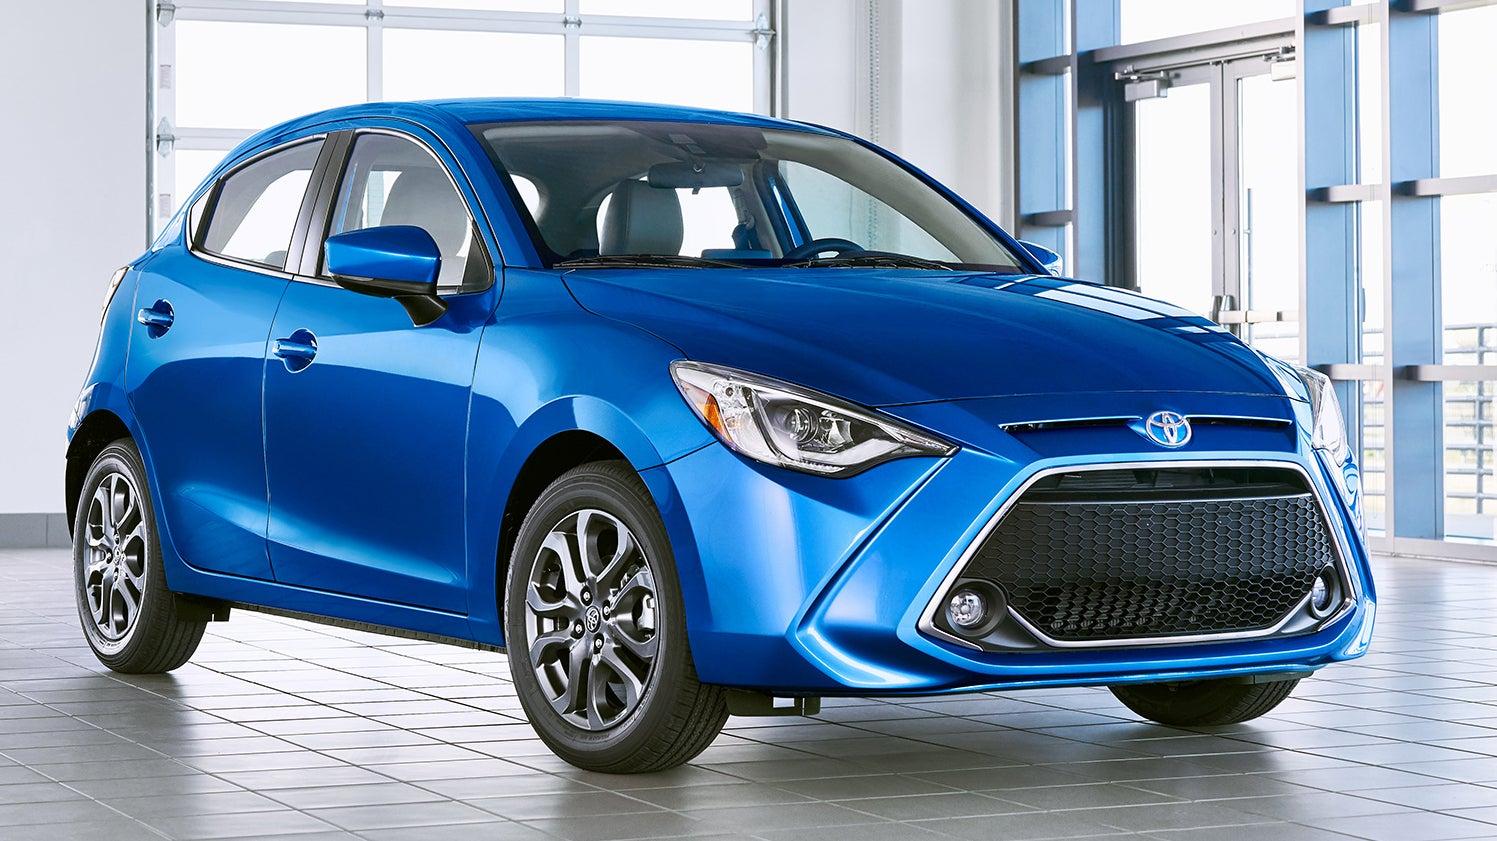 2016 - [Toyota] Yaris Sedan Ir9dcvr2tevwluvs2kjx